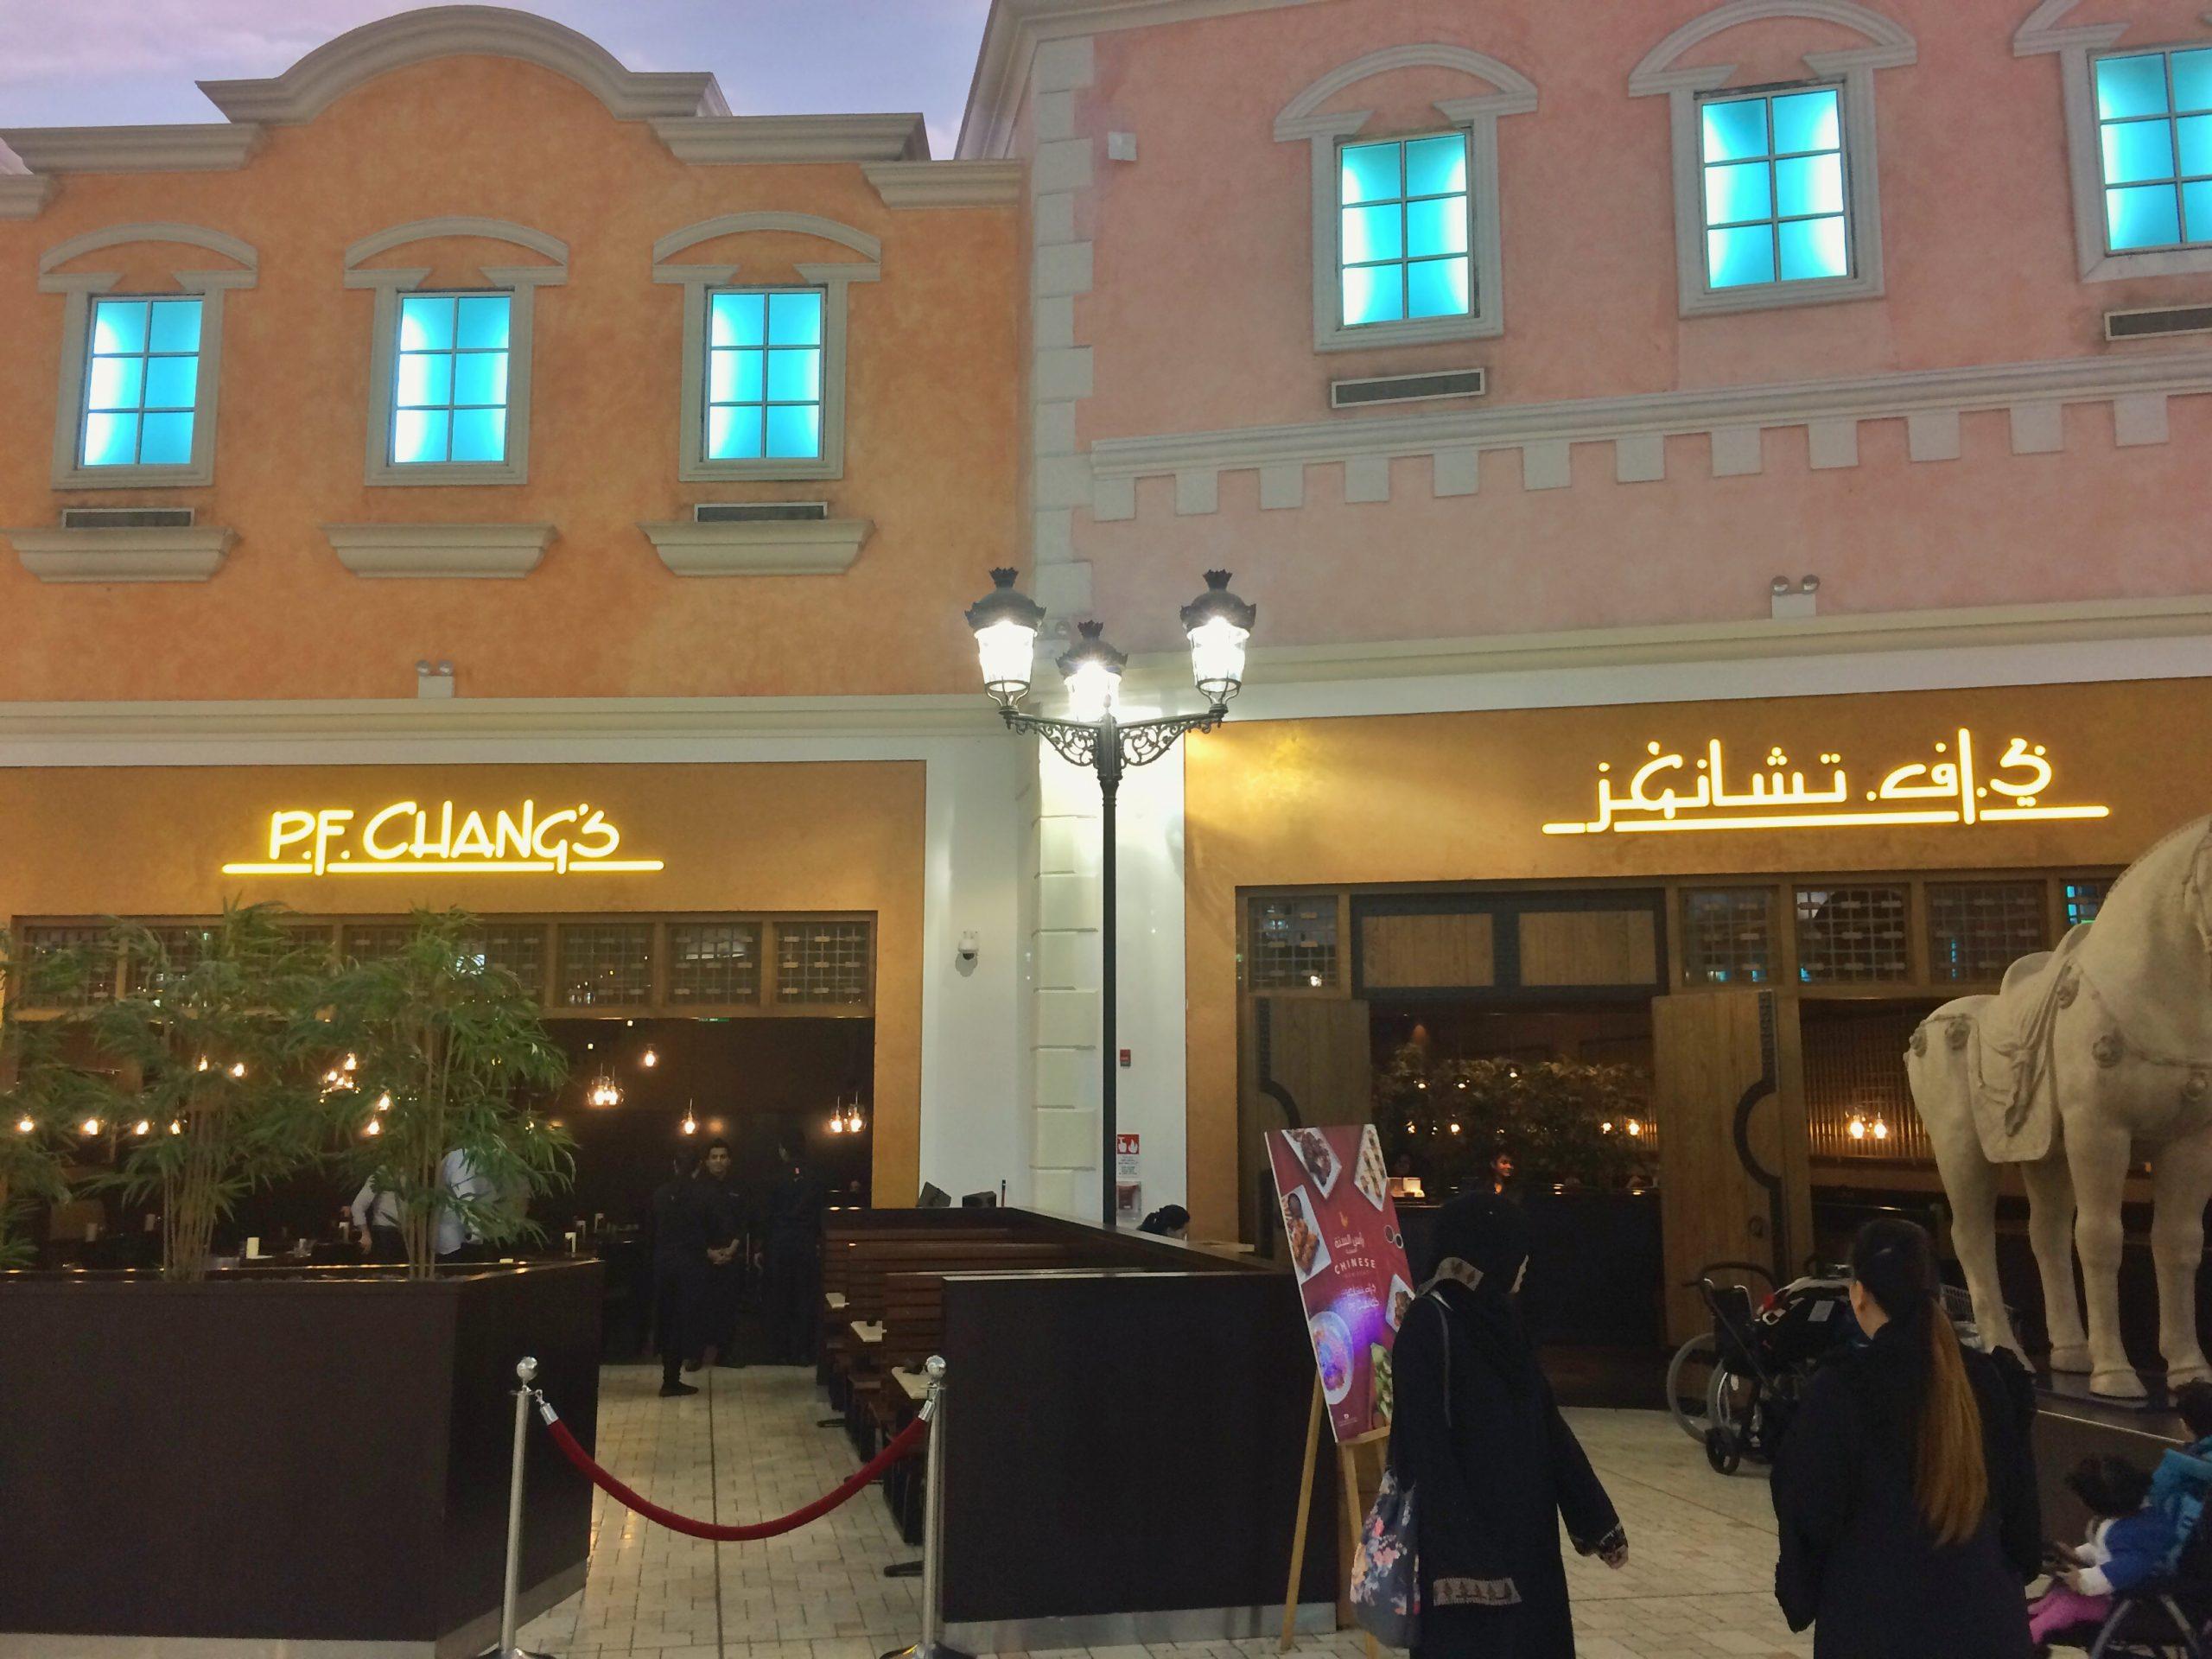 PF Changs inside Villagio Mall in Doha, Qatar